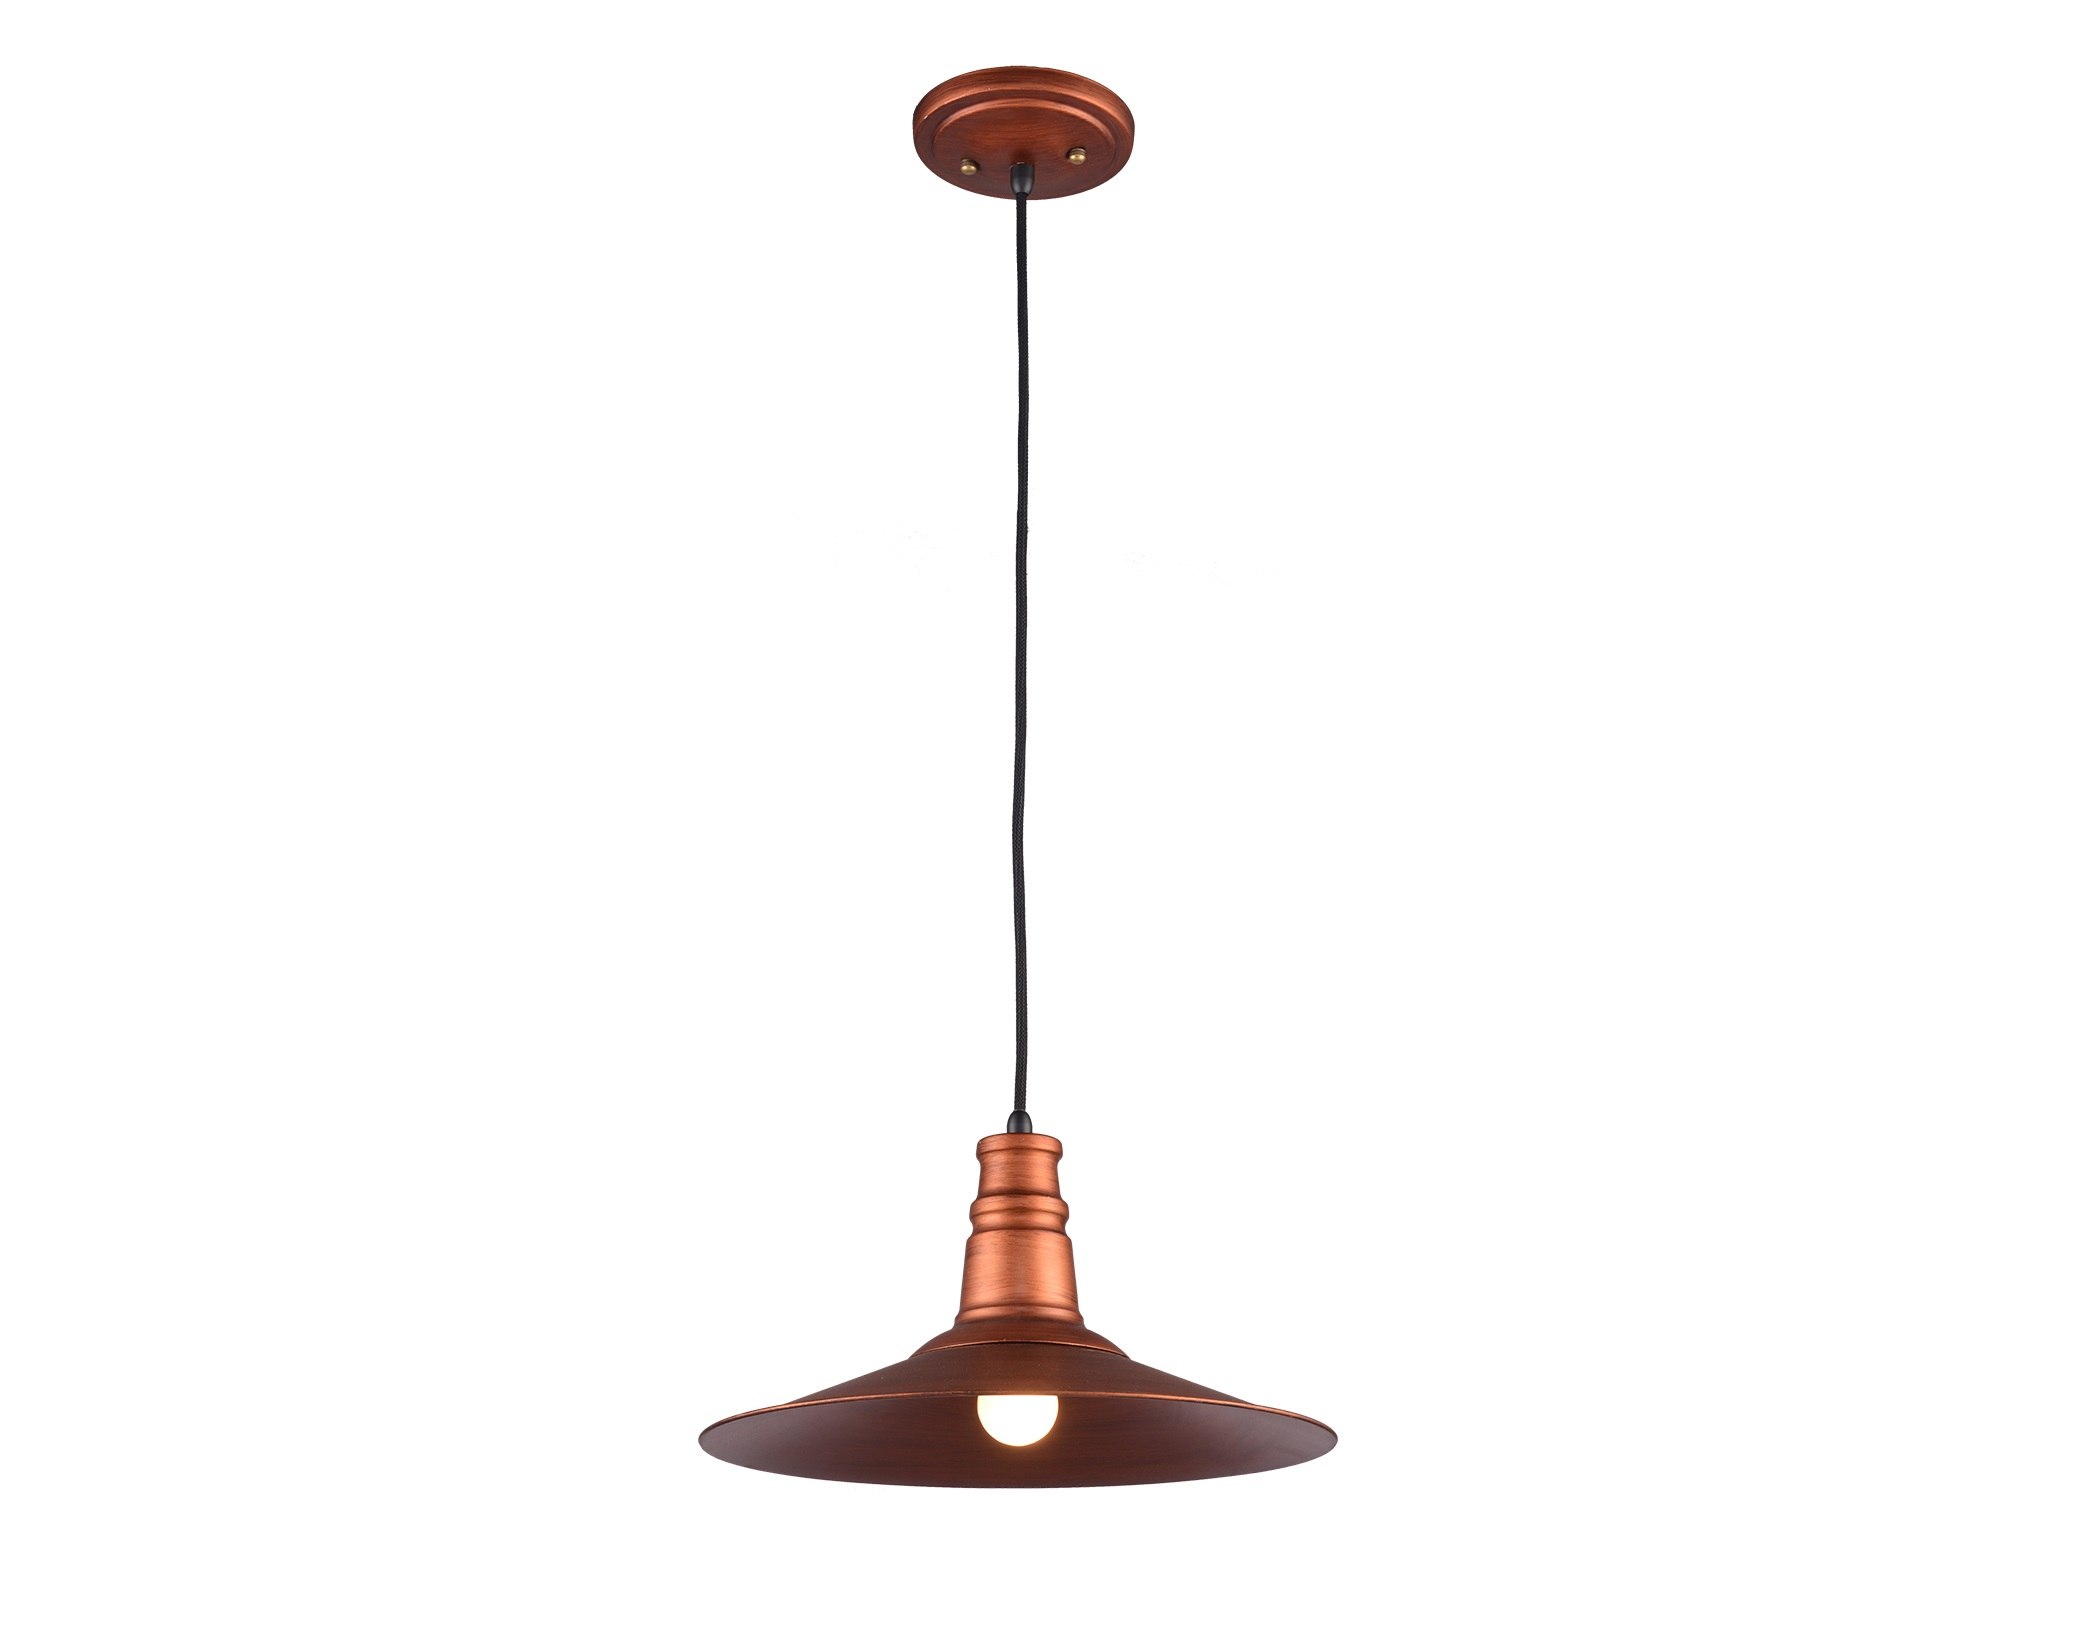 Подвесной светильникПодвесные светильники<br>&amp;lt;div&amp;gt;&amp;lt;div&amp;gt;Вид цоколя: E27&amp;lt;/div&amp;gt;&amp;lt;div&amp;gt;Мощность: 60W&amp;lt;/div&amp;gt;&amp;lt;div&amp;gt;Количество ламп: 1&amp;lt;/div&amp;gt;&amp;lt;div&amp;gt;Наличие ламп: отсутствуют.&amp;lt;/div&amp;gt;&amp;lt;/div&amp;gt;<br><br>Material: Металл<br>Width см: None<br>Height см: 120<br>Diameter см: 35